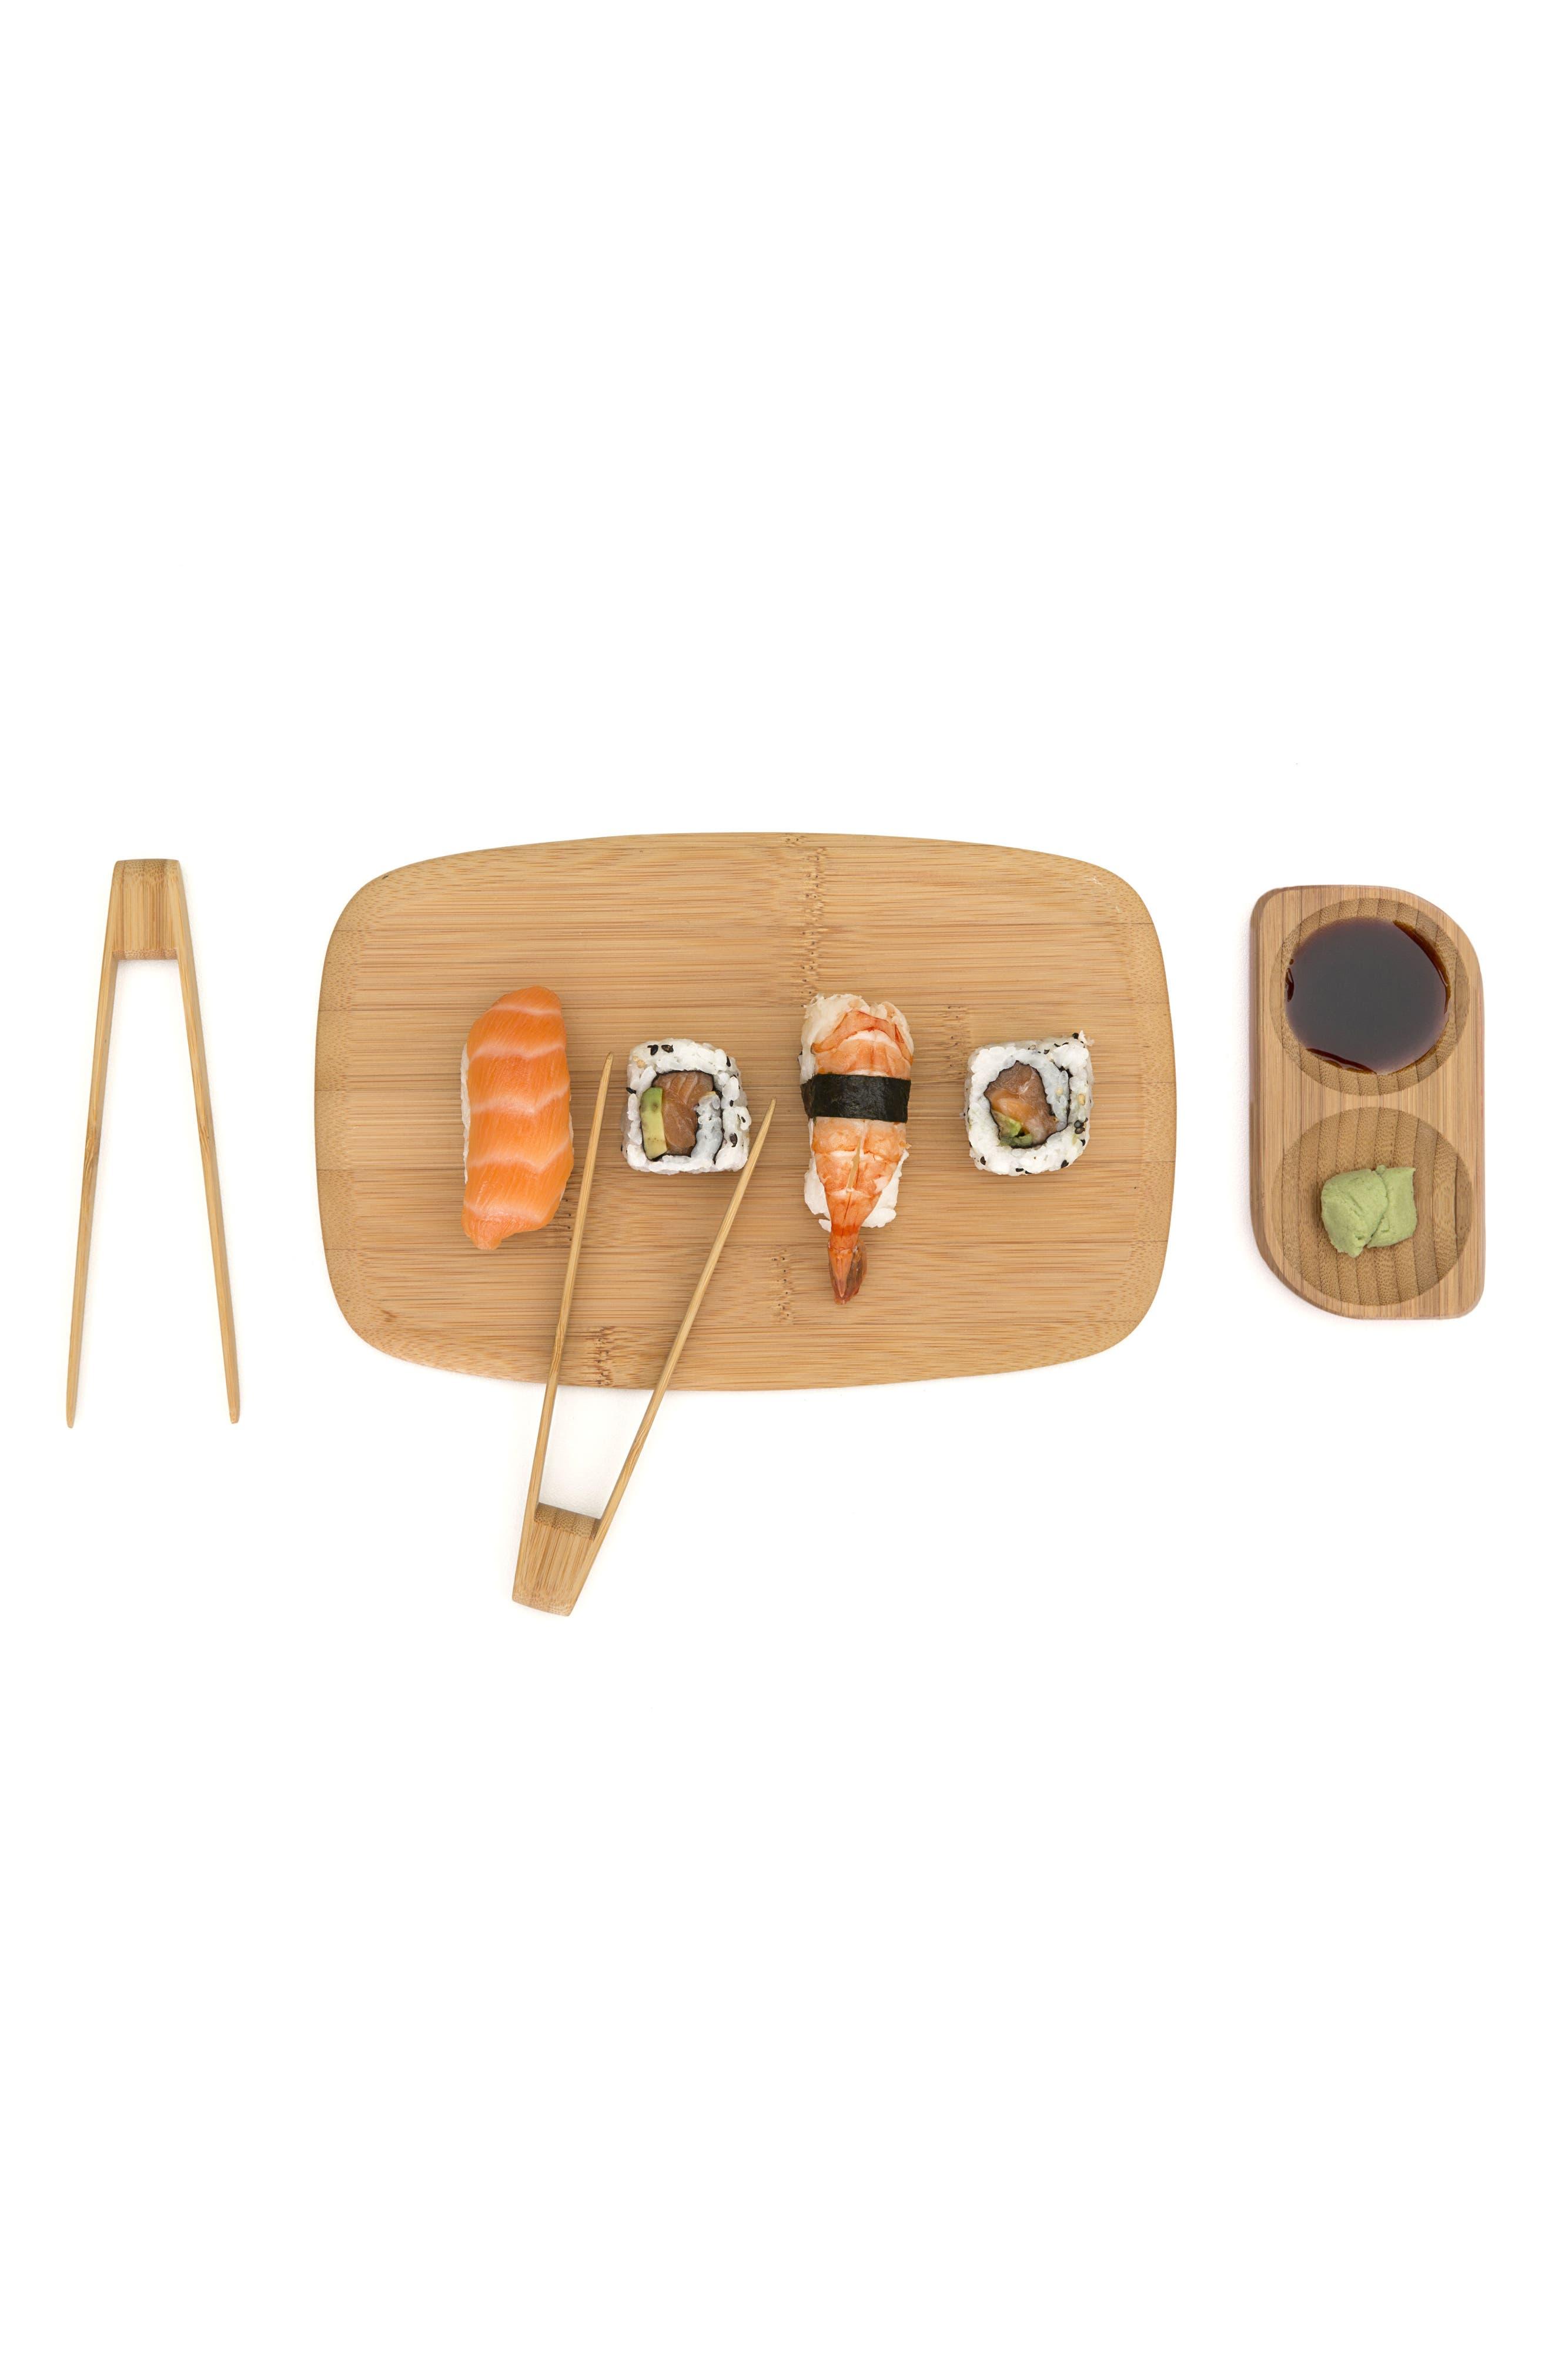 3-Piece Bamboo Sushi Tray & Songs Set,                             Alternate thumbnail 3, color,                             Natural